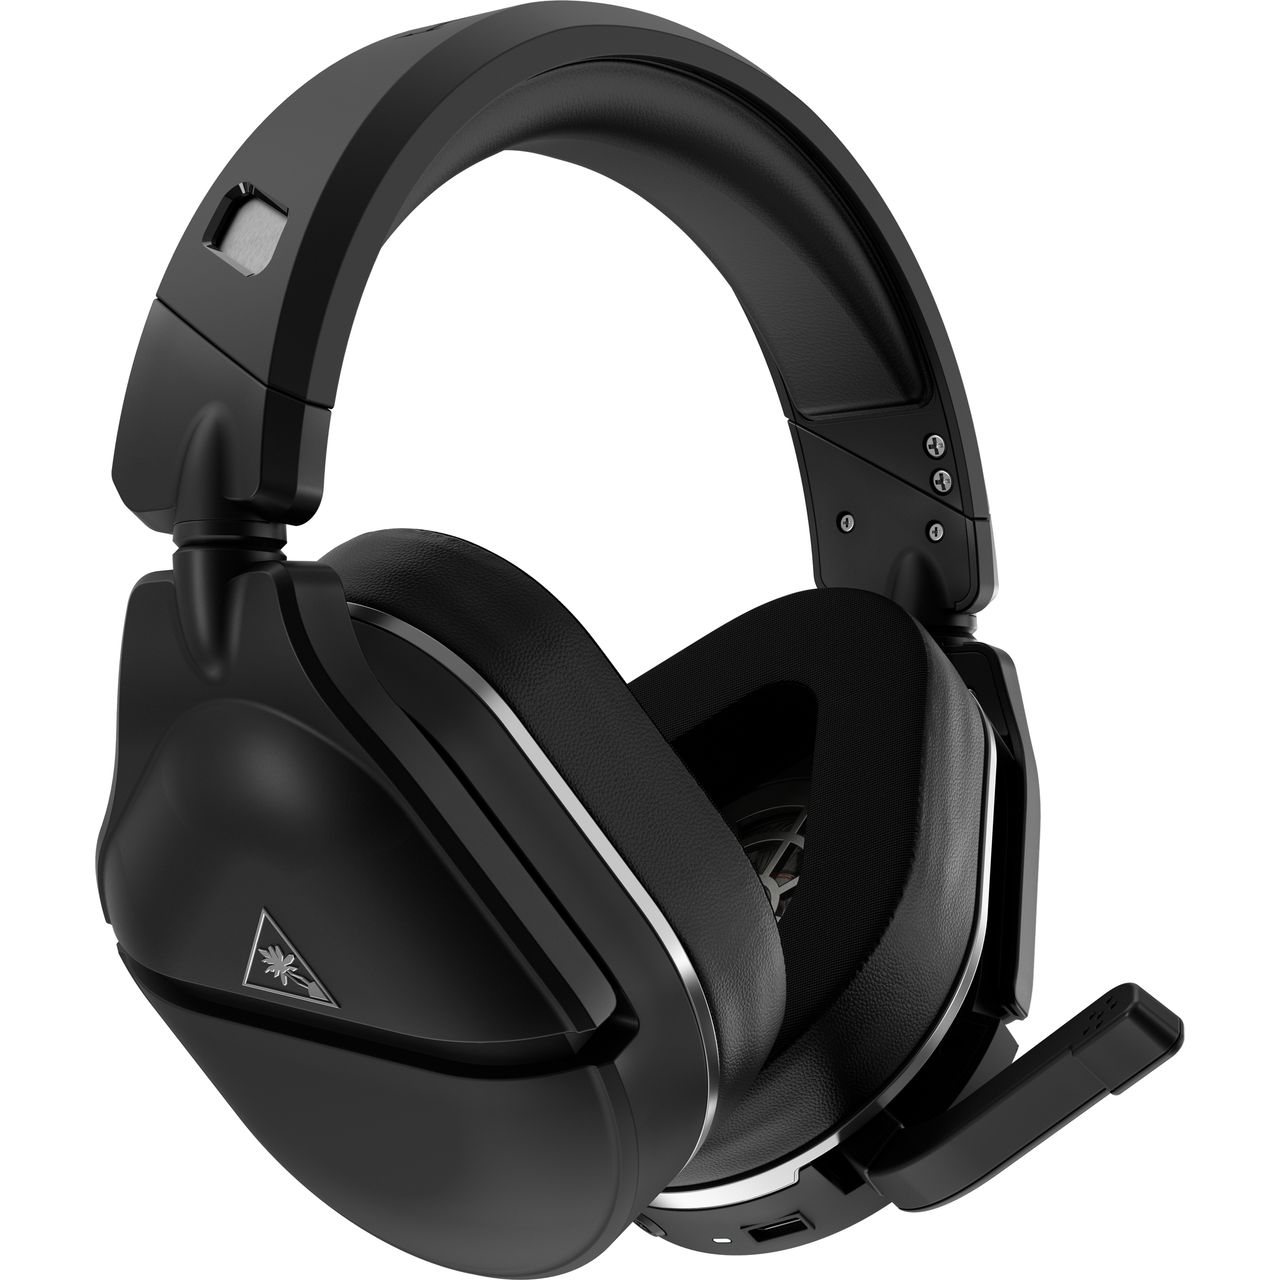 Turtle Beach Stealth Gen2 700P Gaming Headset - Black